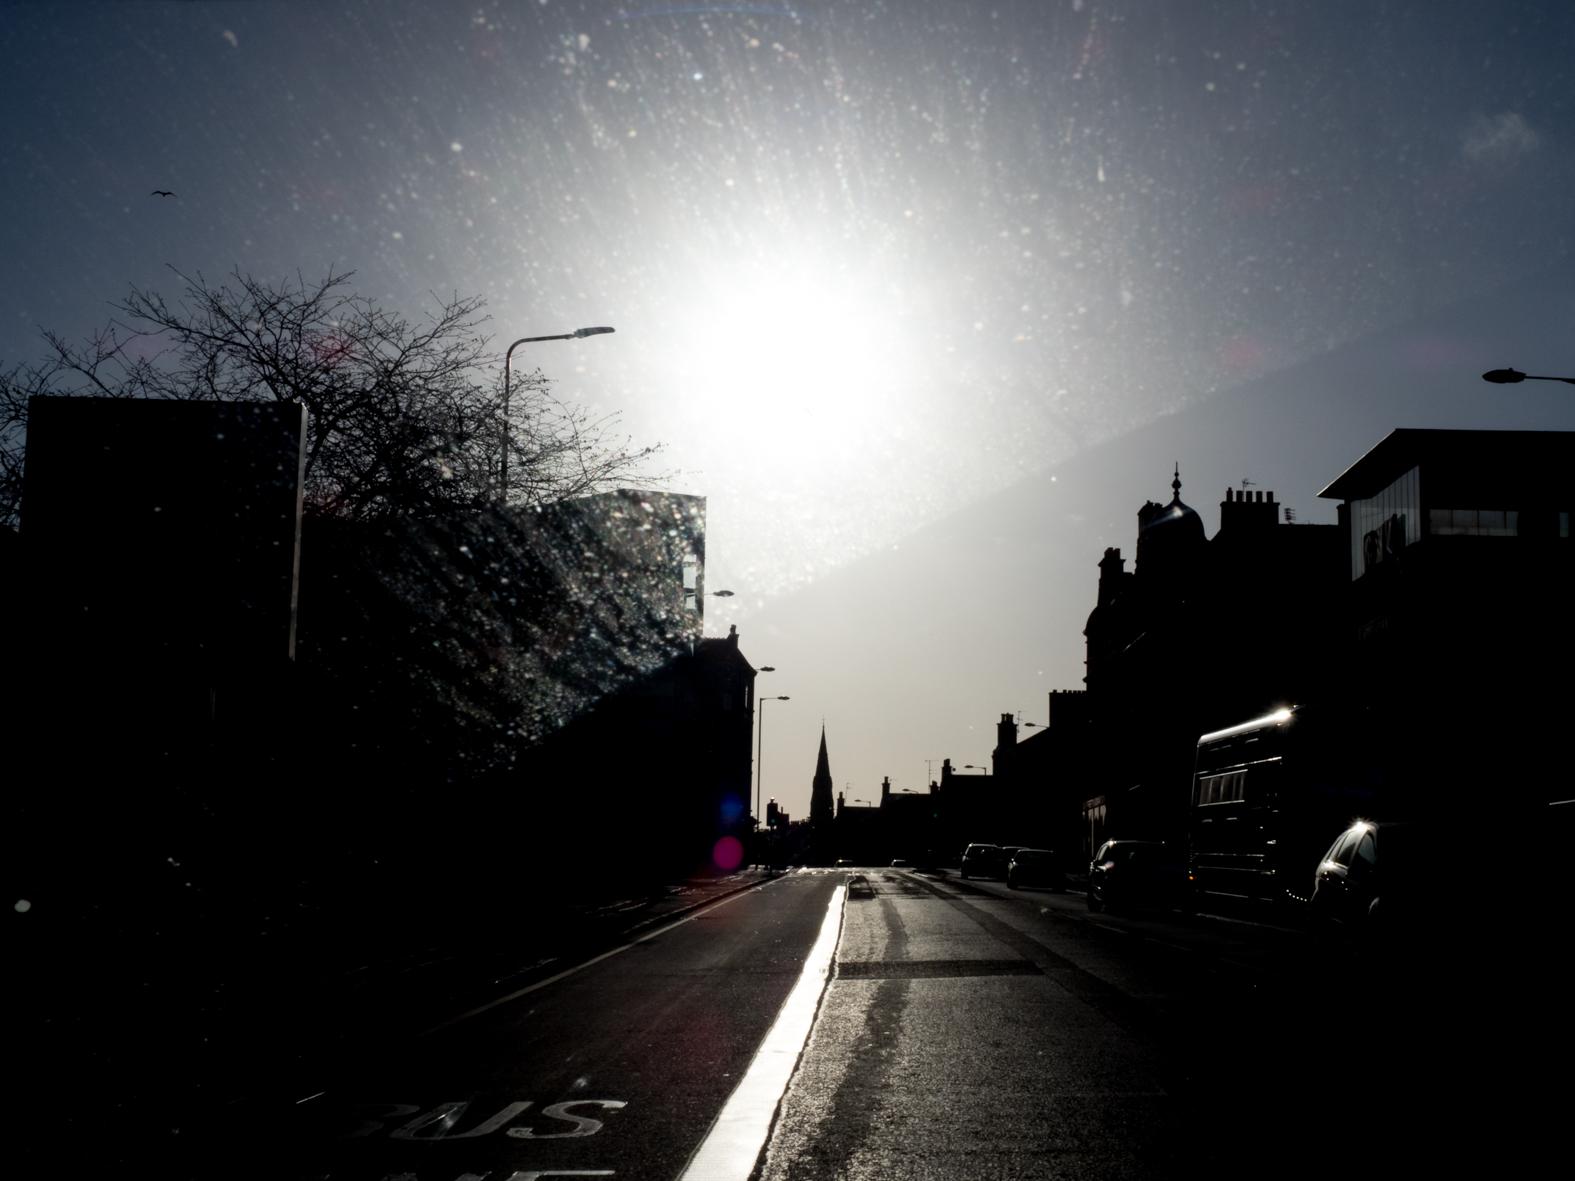 The A1 East towards Edinburgh where it terminates.